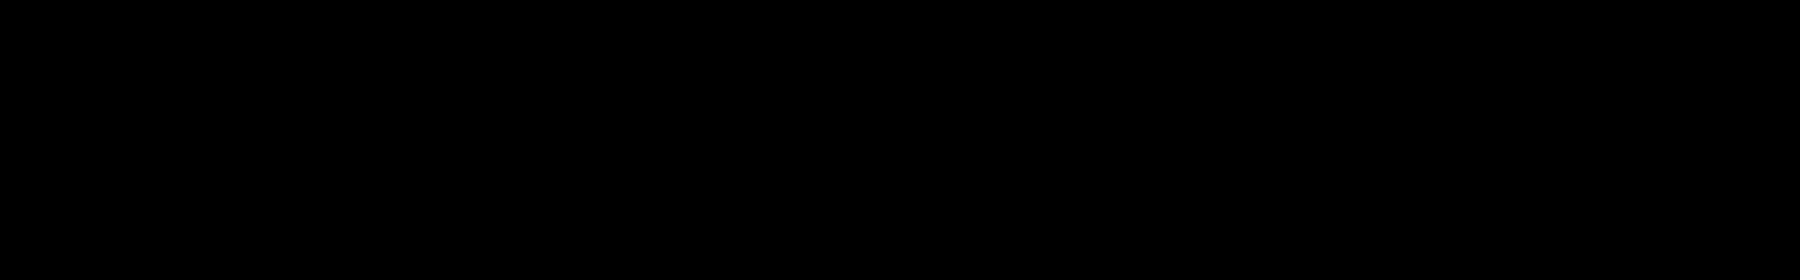 Ponle Reggaeton audio waveform